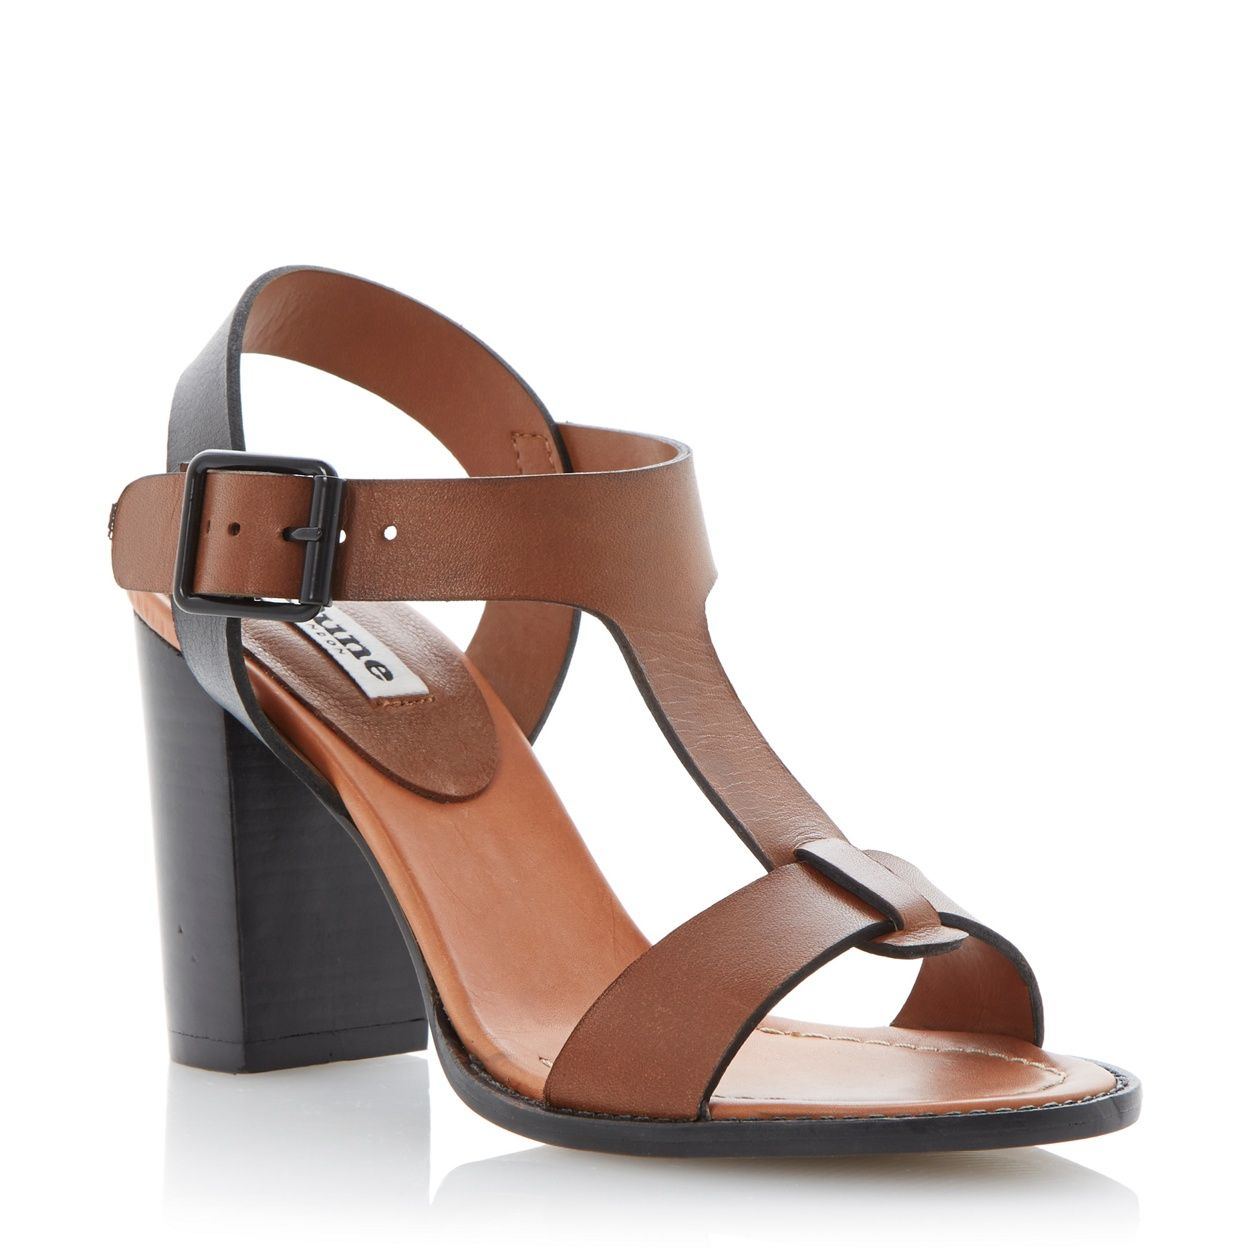 Women's sandals debenhams - Dune Tan High Block Heel Sandal At Debenhams Com